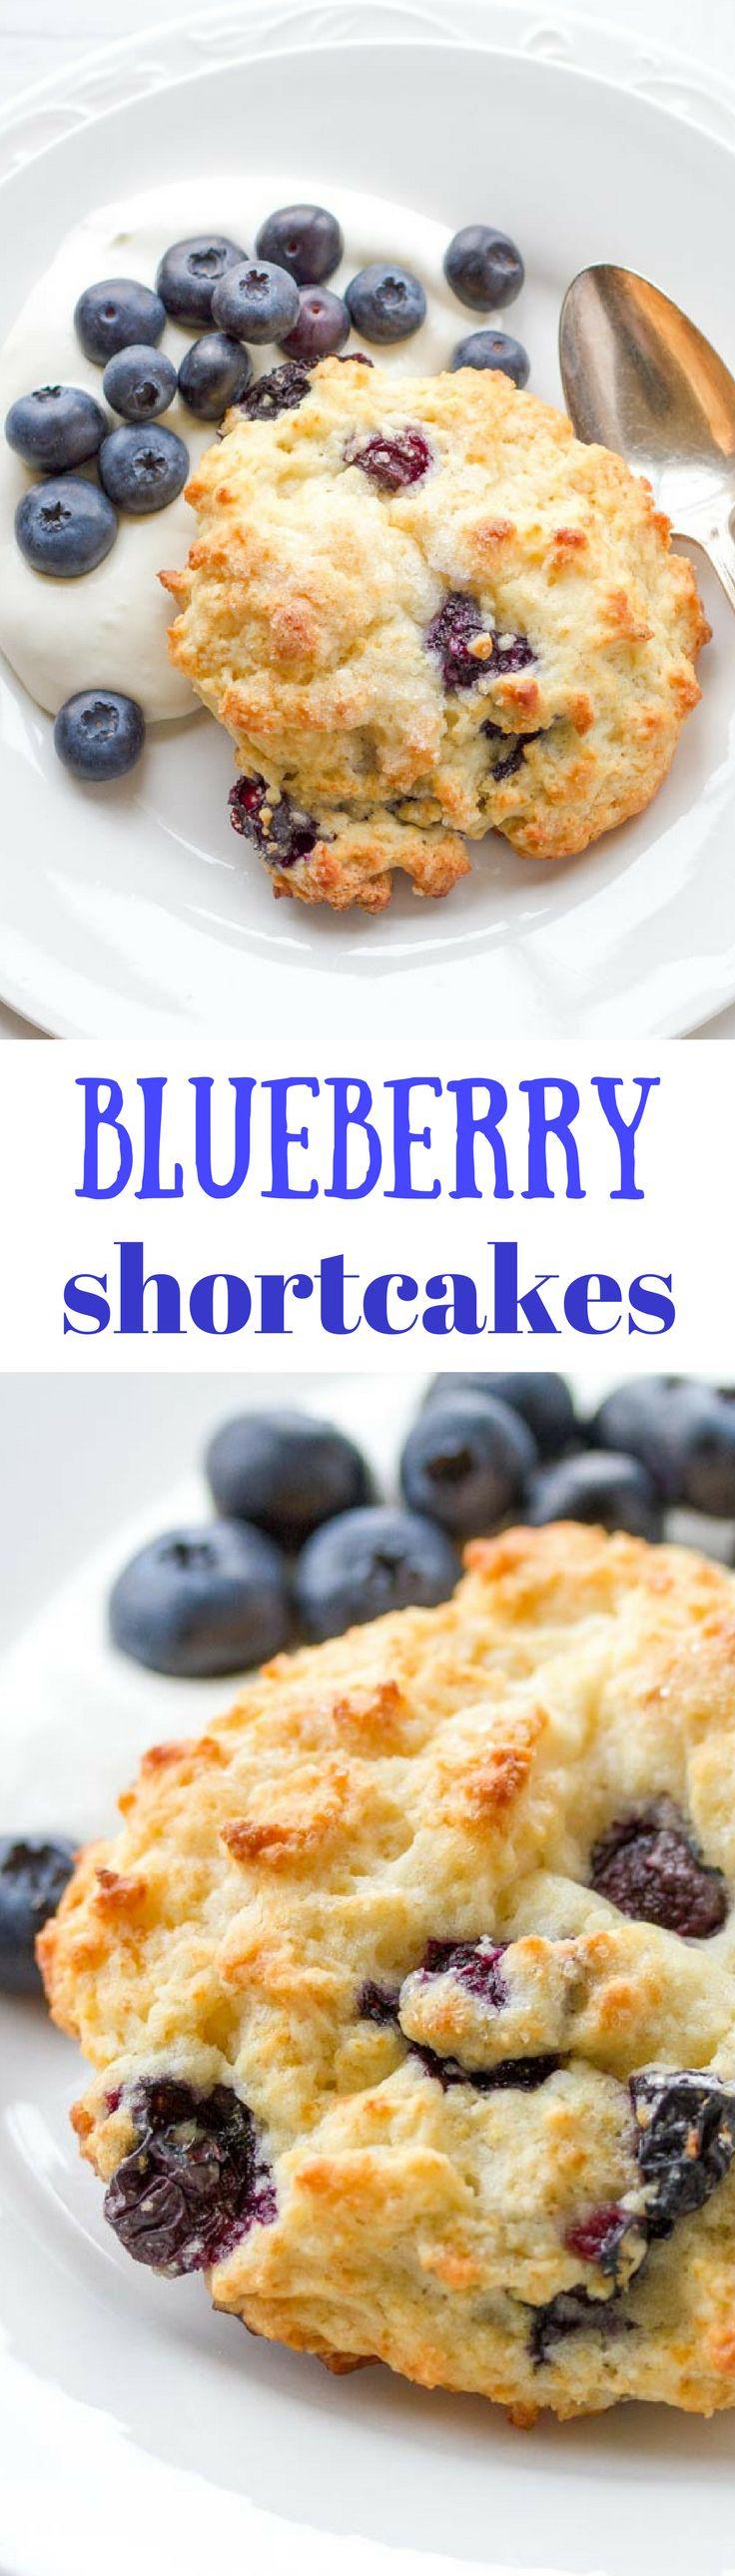 Best 25+ Blueberry shortcake ideas on Pinterest ...